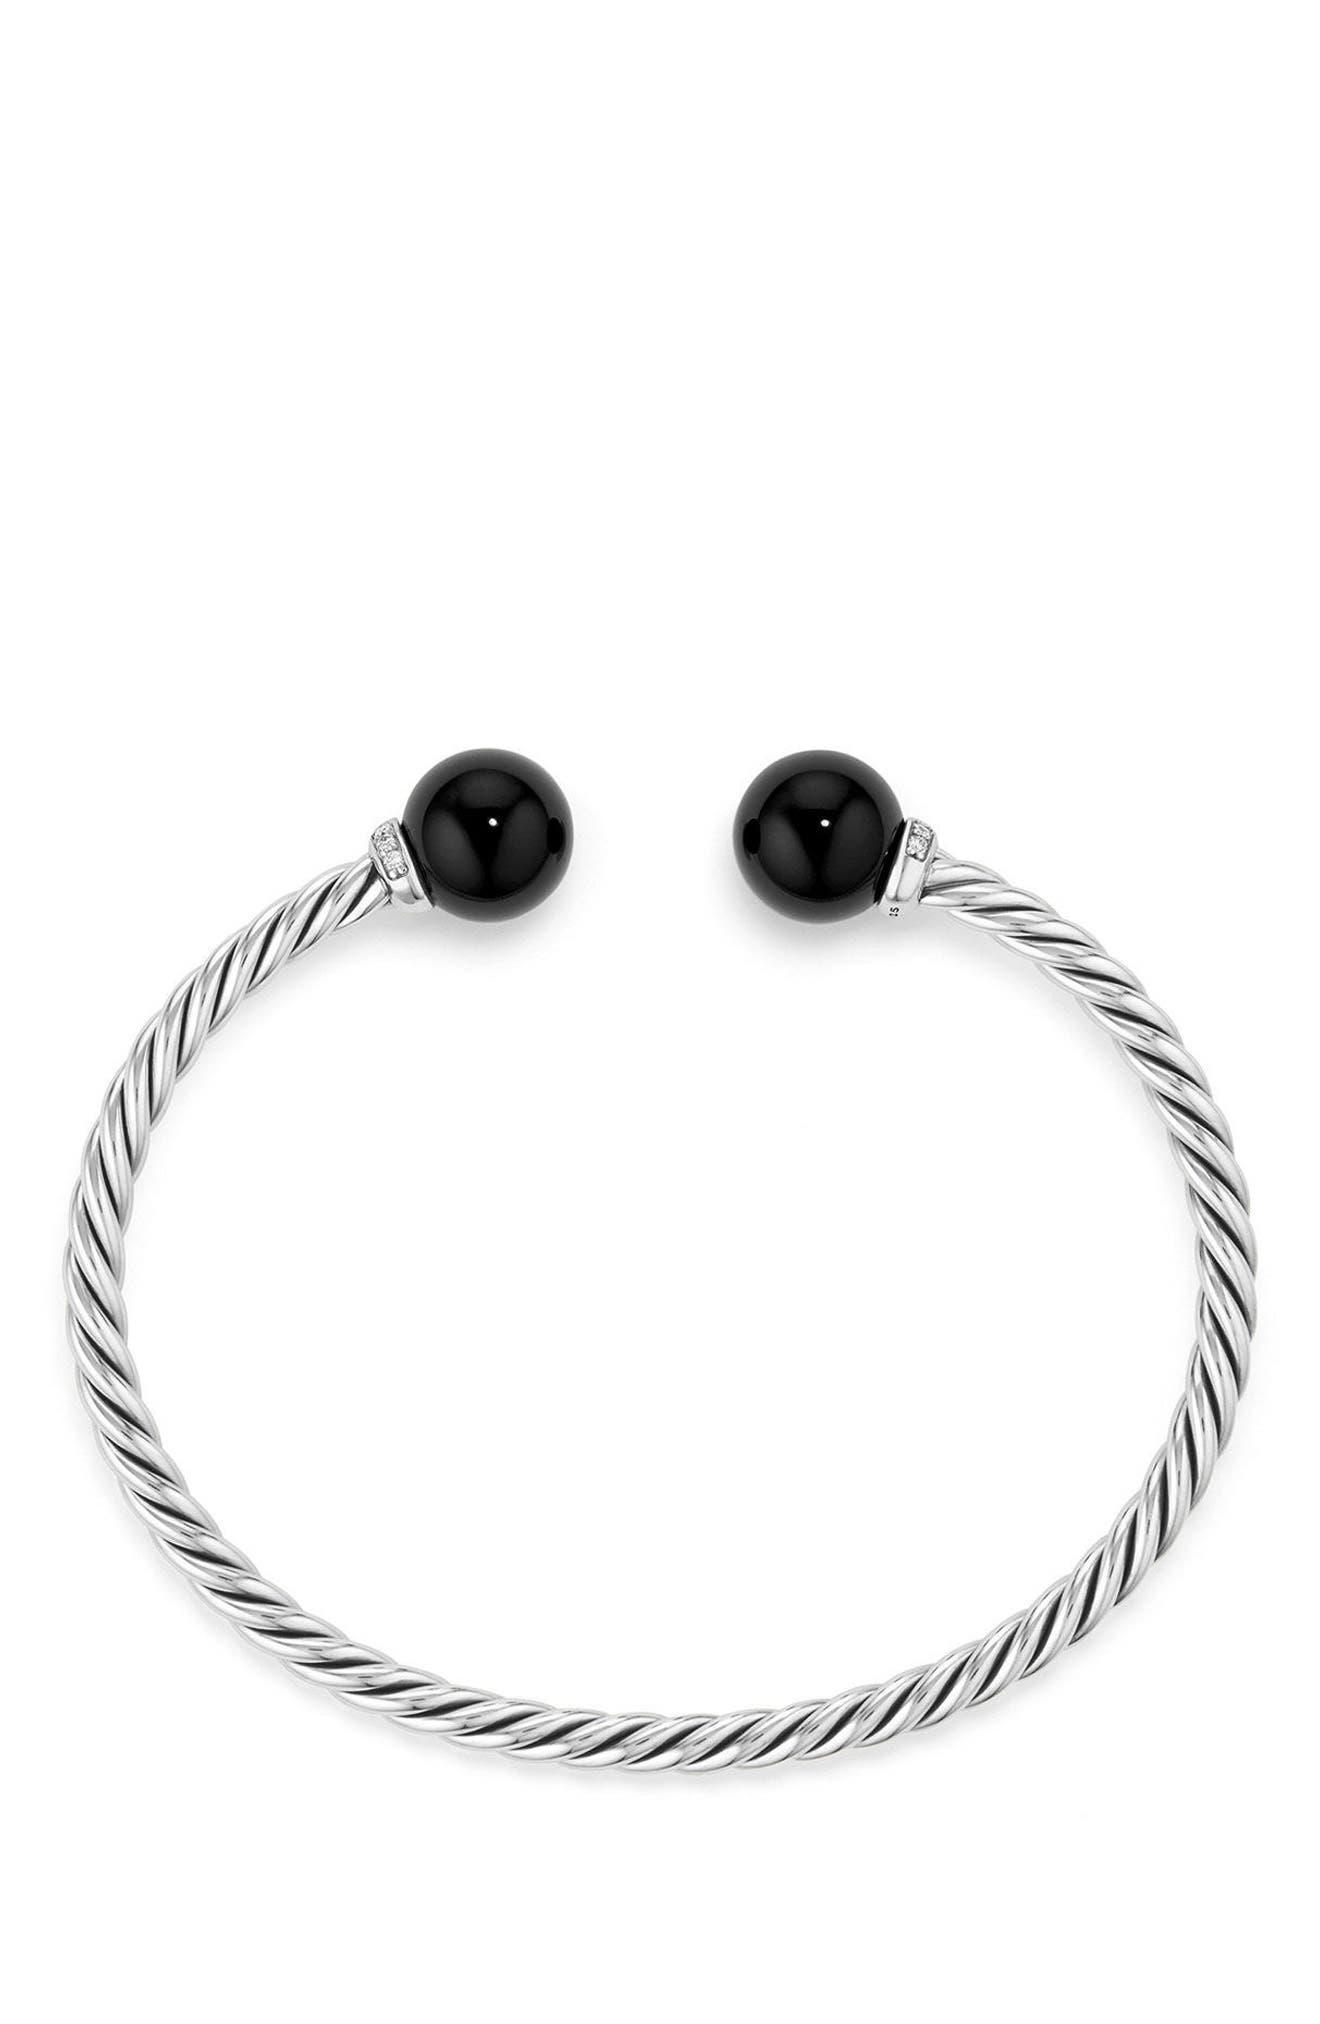 DAVID YURMAN, Solari Bead Bracelet with Diamonds, Alternate thumbnail 2, color, SILVER/ DIAMOND/ BLACK ONYX